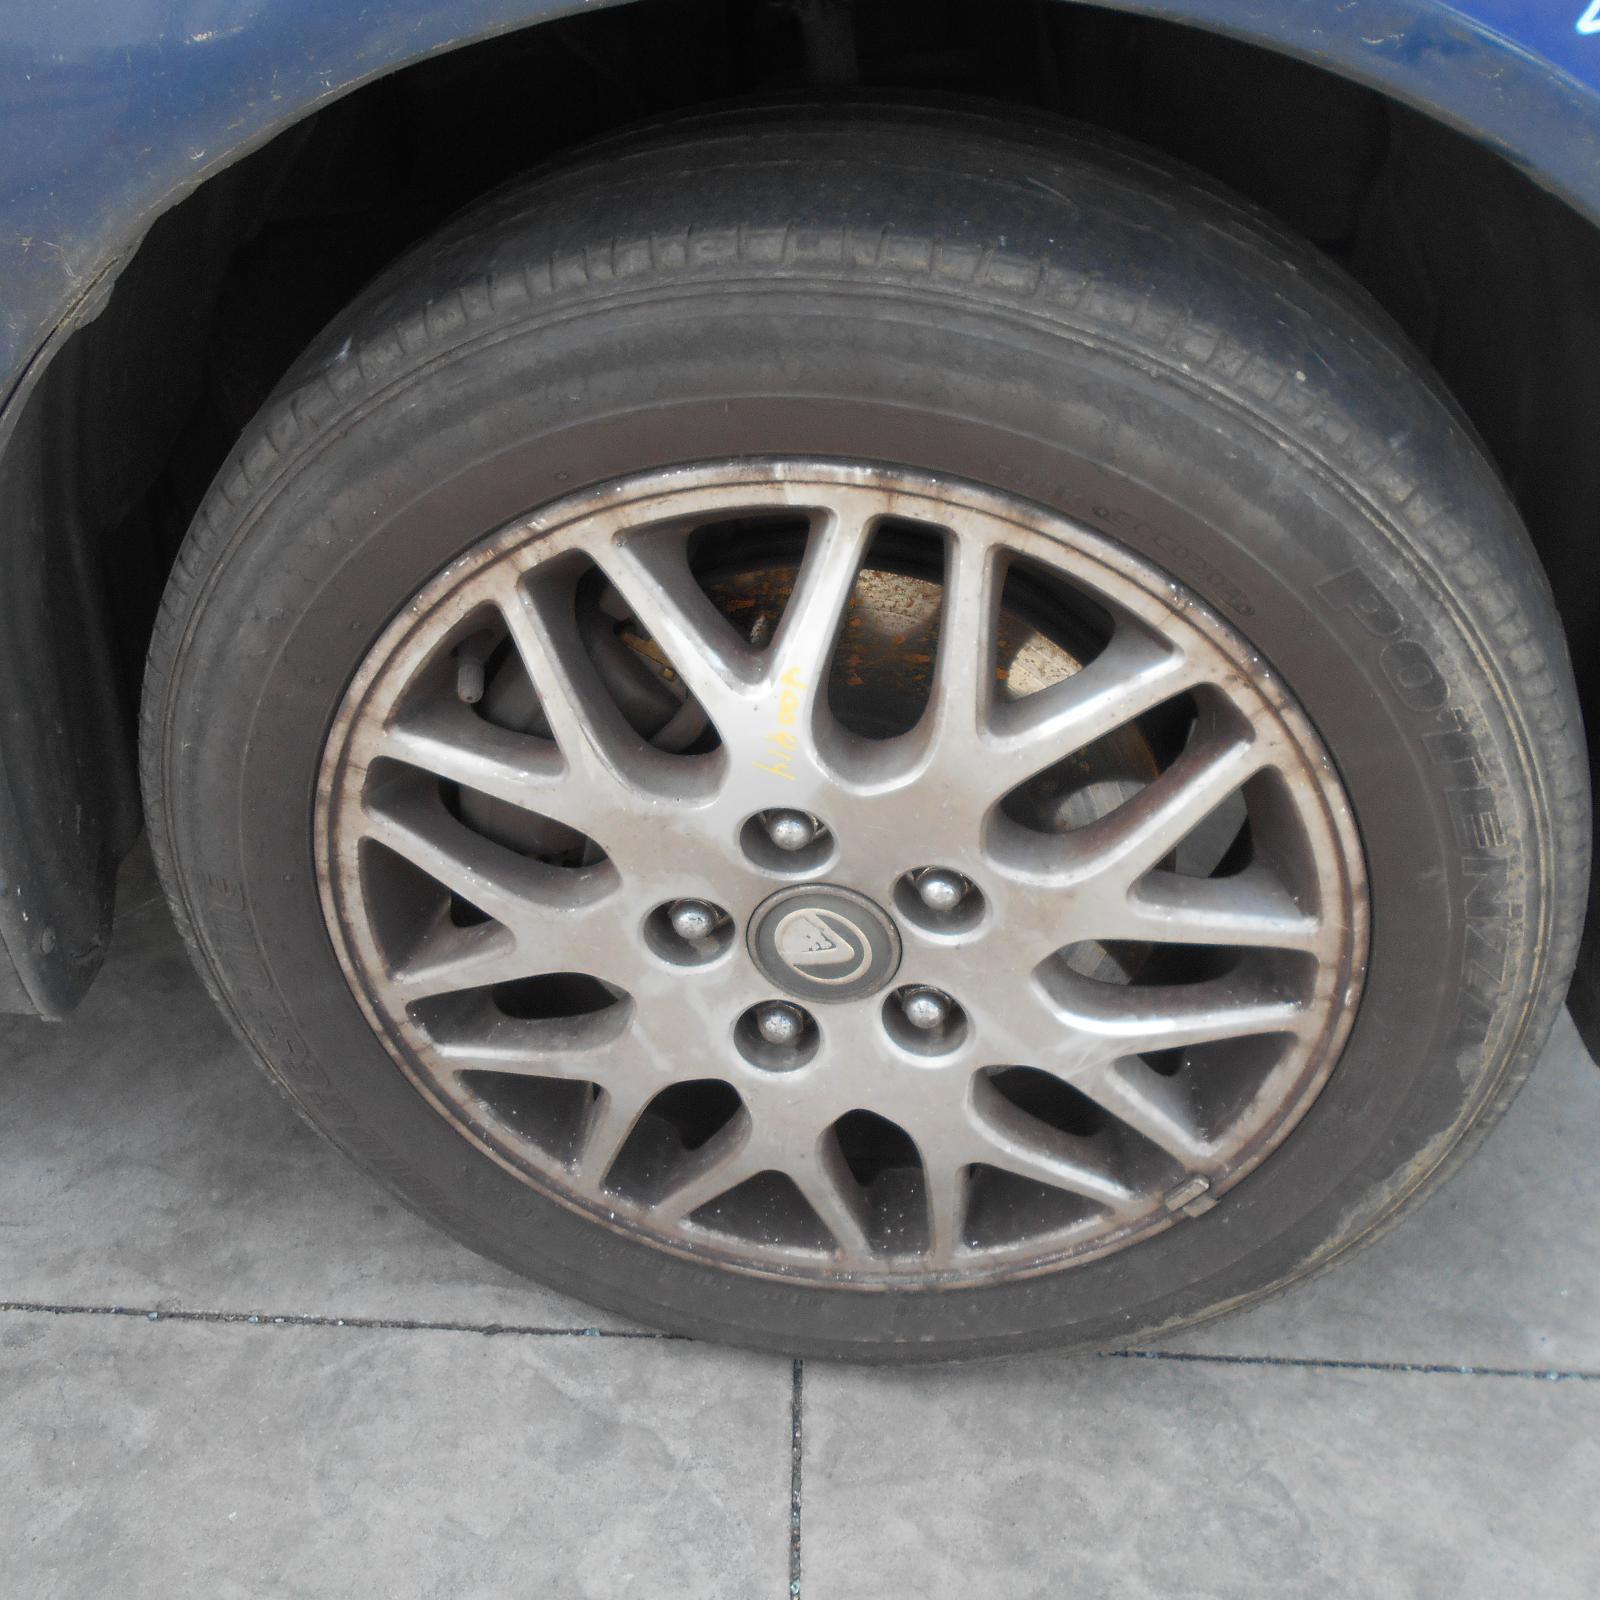 LEXUS IS200/IS300, Wheel Mag, IS200, FACTORY, 16X6.5IN, 01/98-10/05